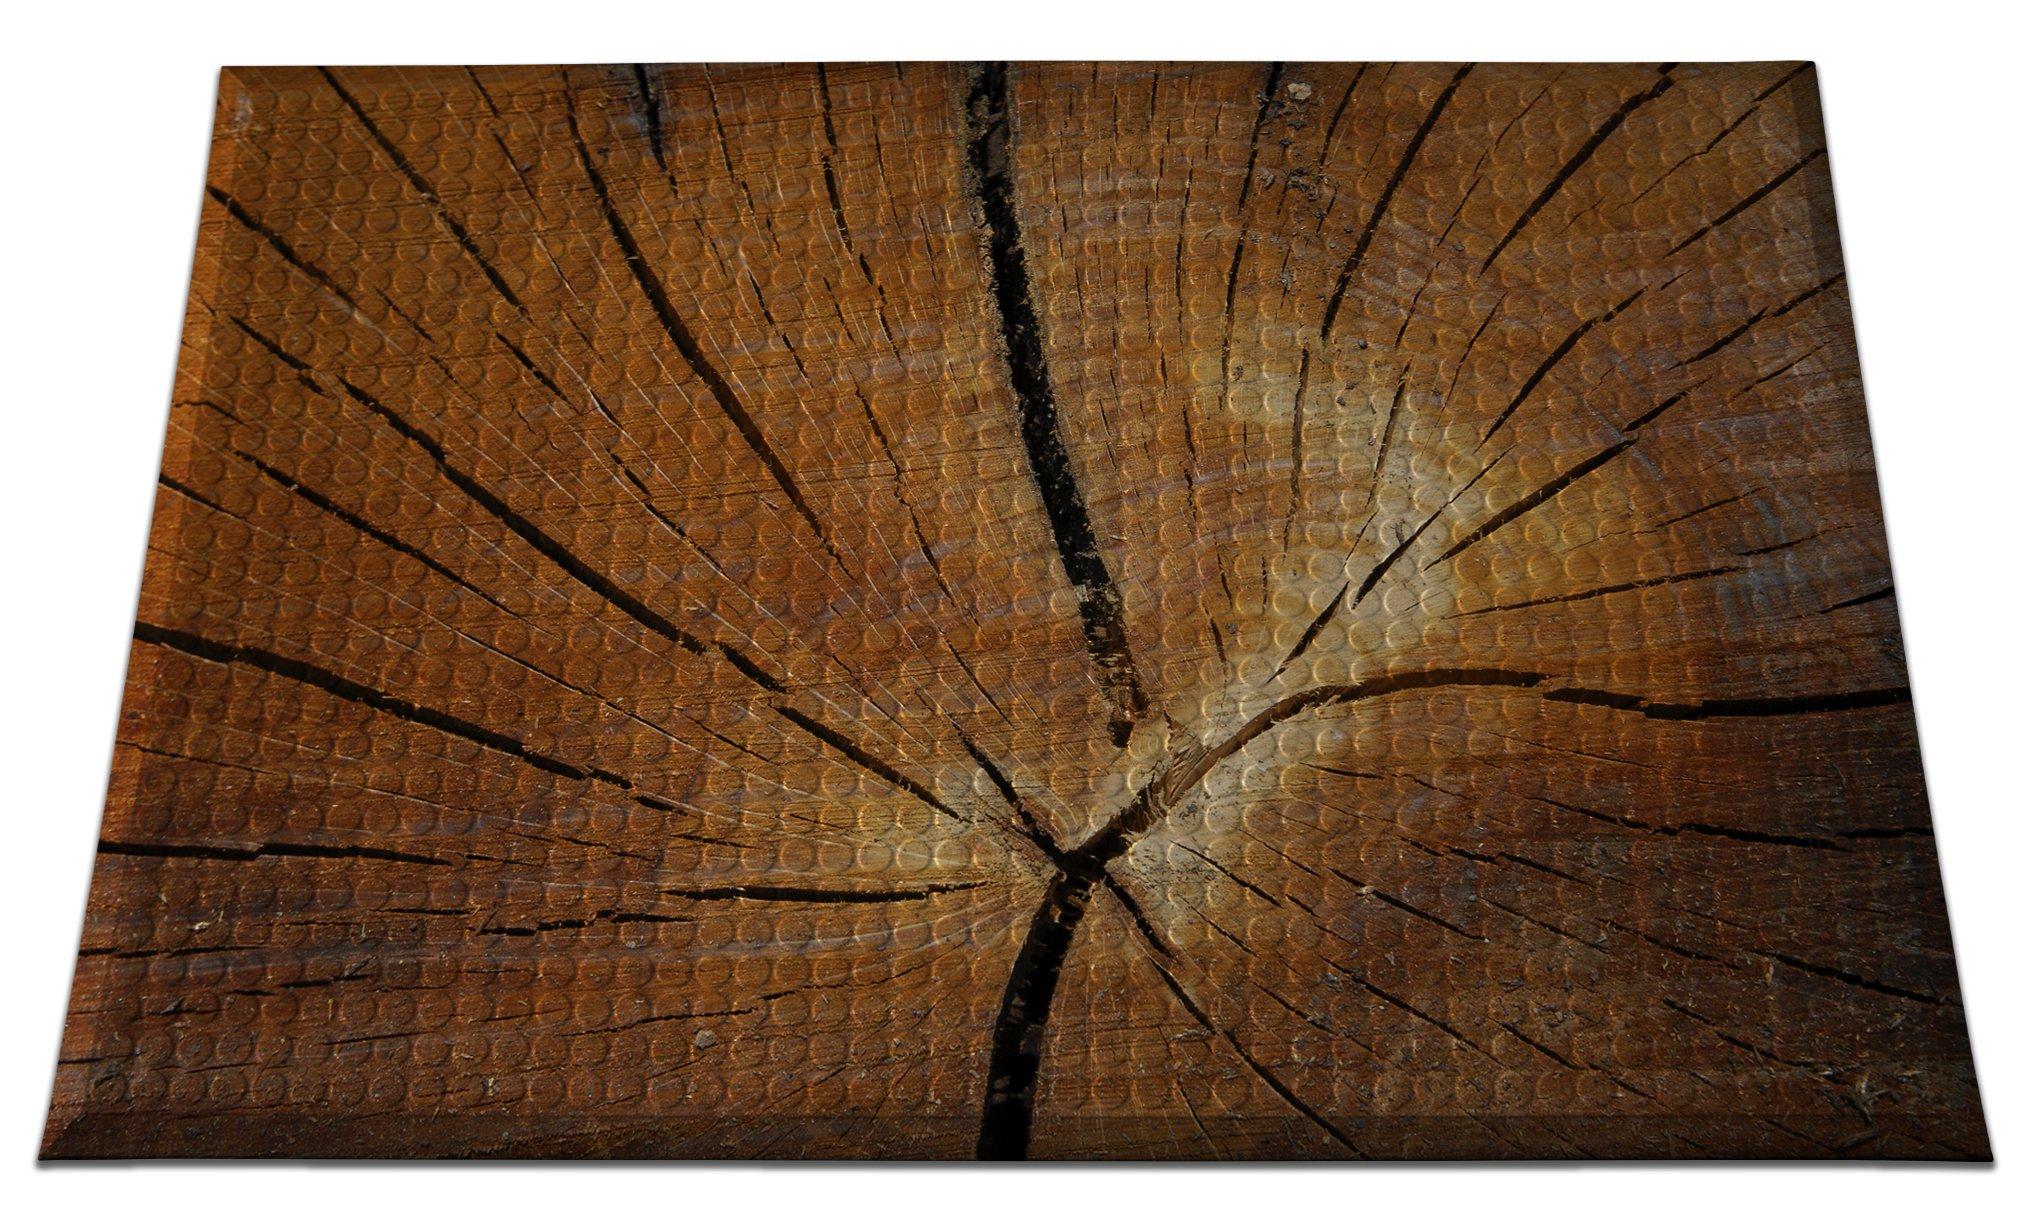 Ergomat INS-0203-07 Home Edition Anti-Fatigue Graphic Floor Mats, Tree Stump Smooth, 2' x 3' by Ergomat